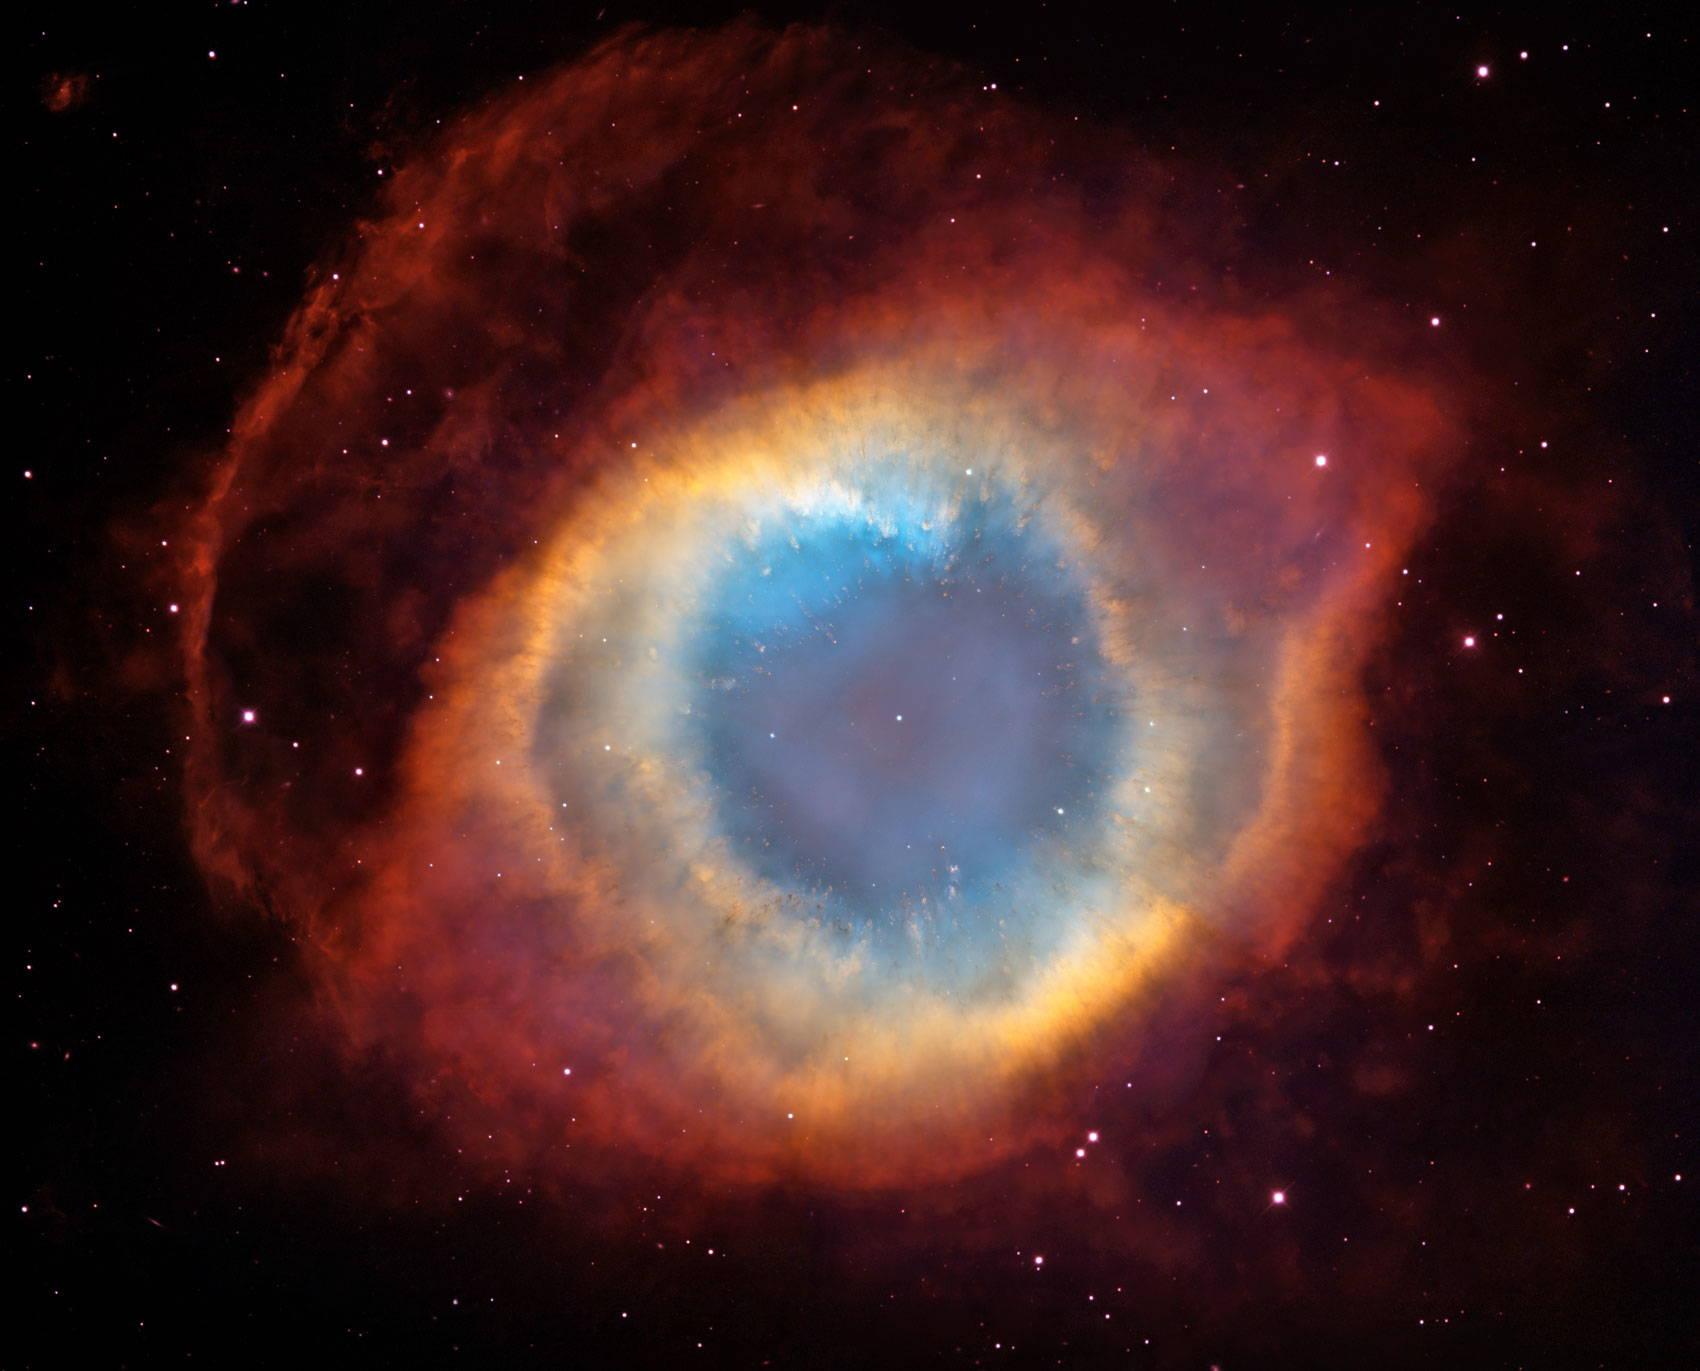 A composite image of a nebula